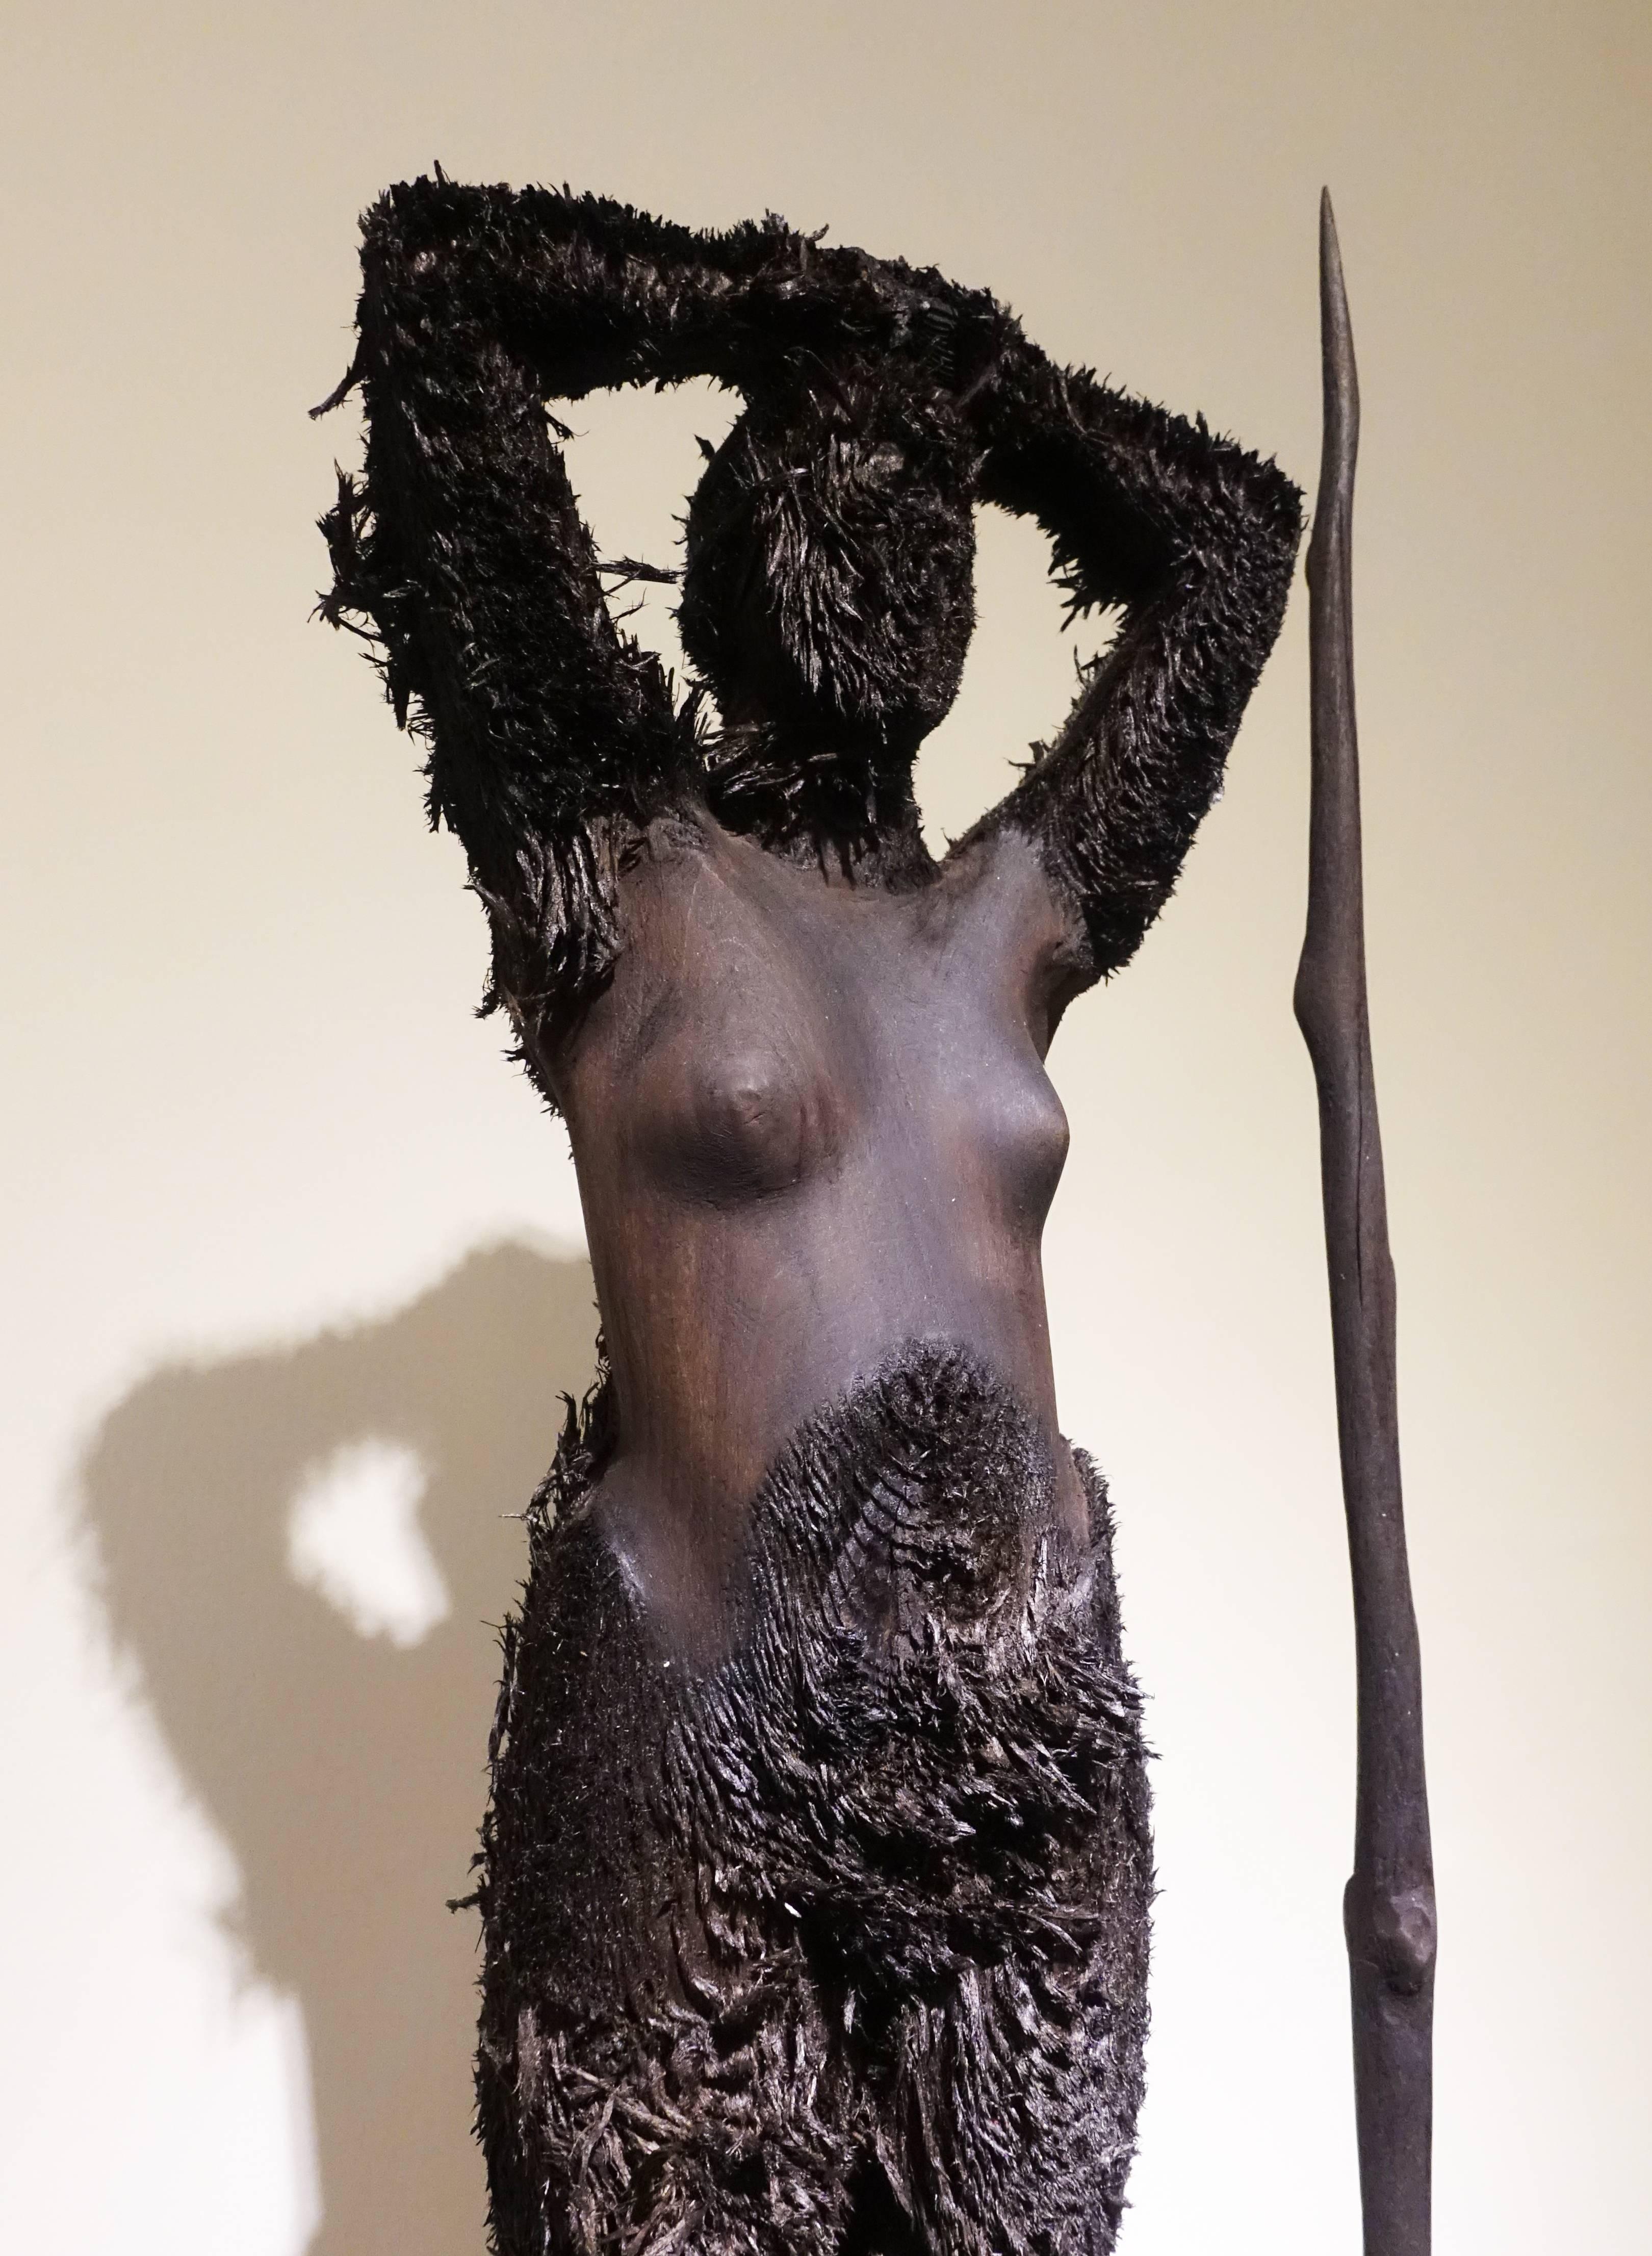 艾倫.德梅茲,《Bozzetto Burning Man》細節,55 x 19 x 12 cm ,Limewood椴木,2014。